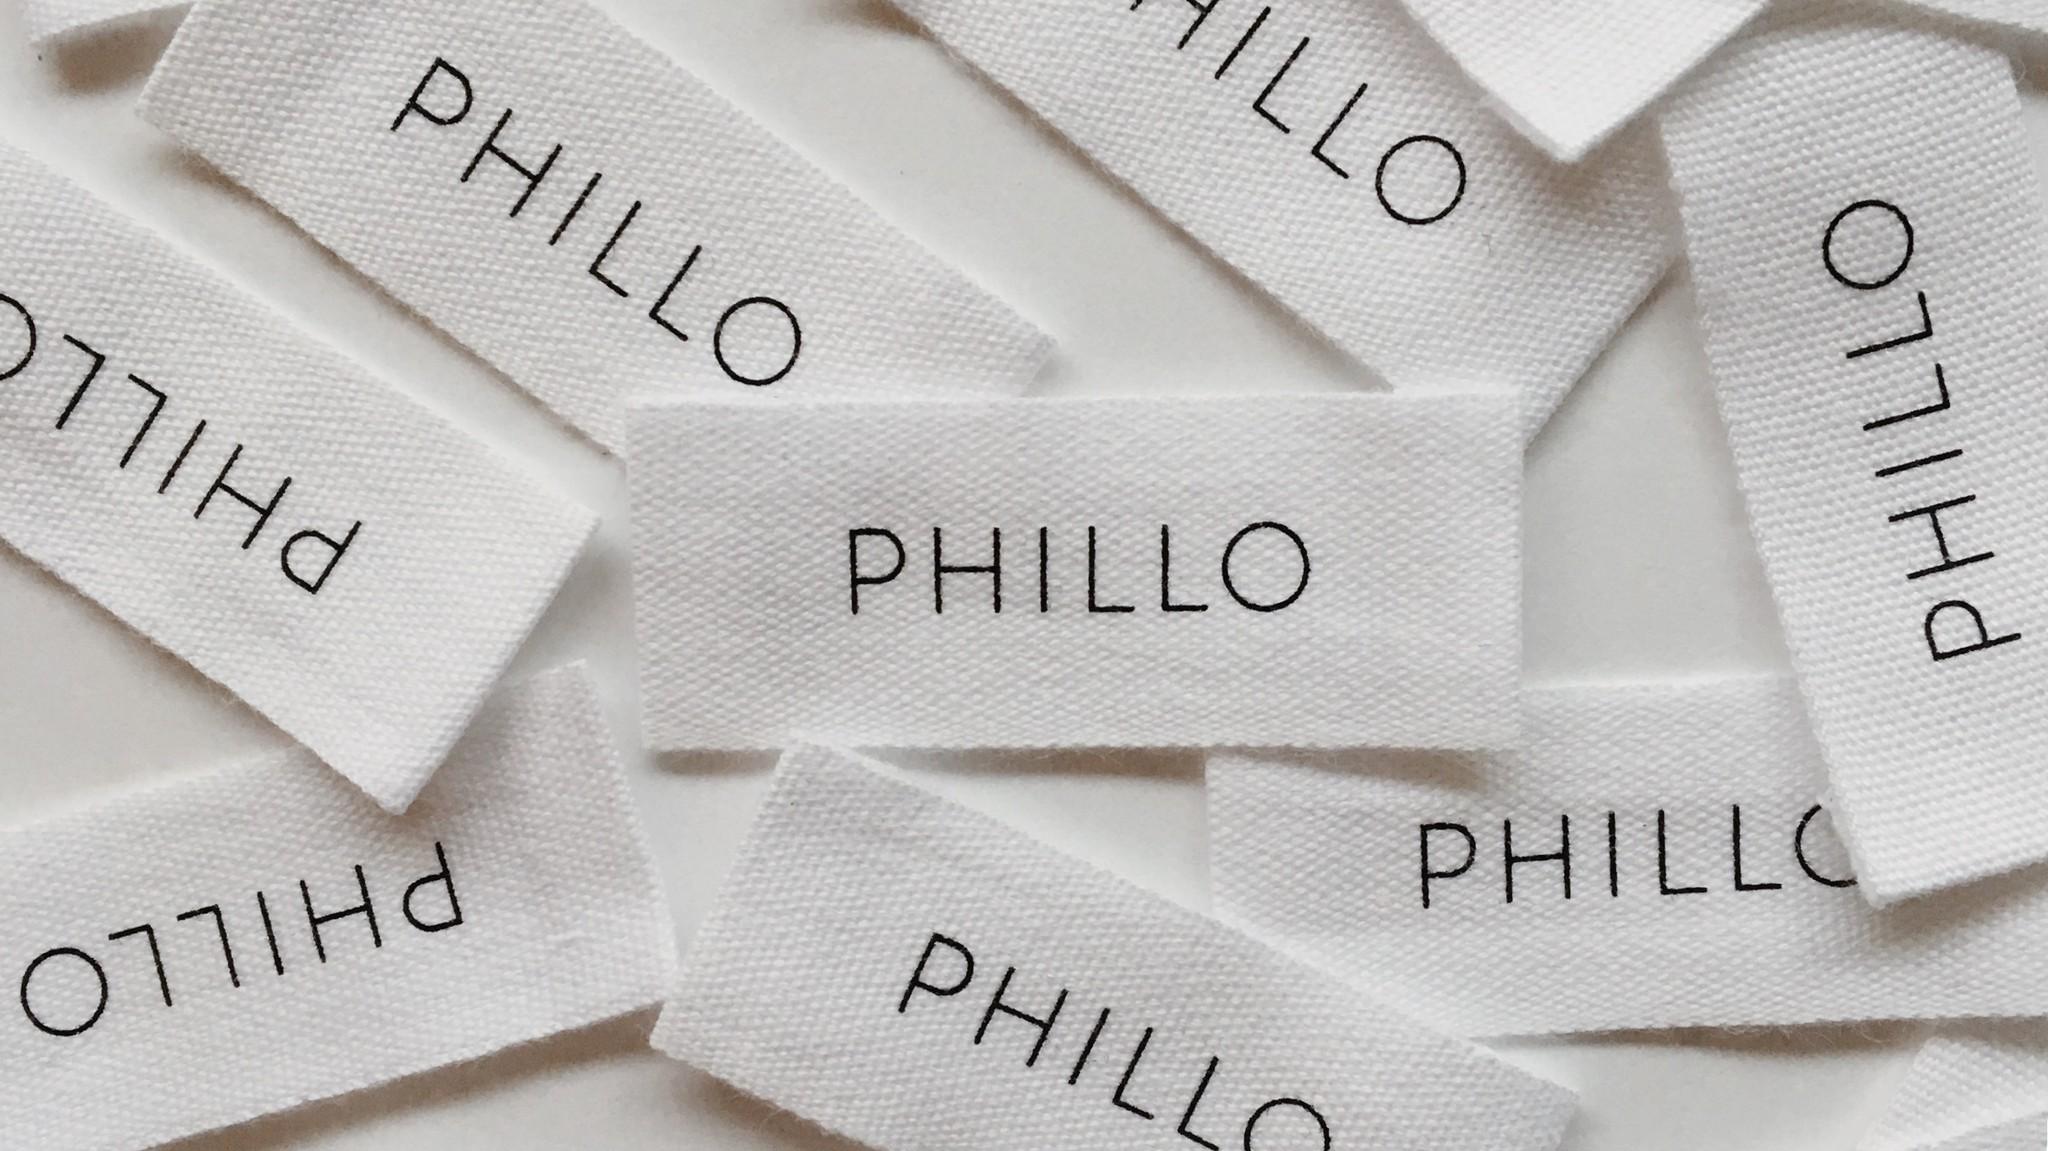 PHILLO website